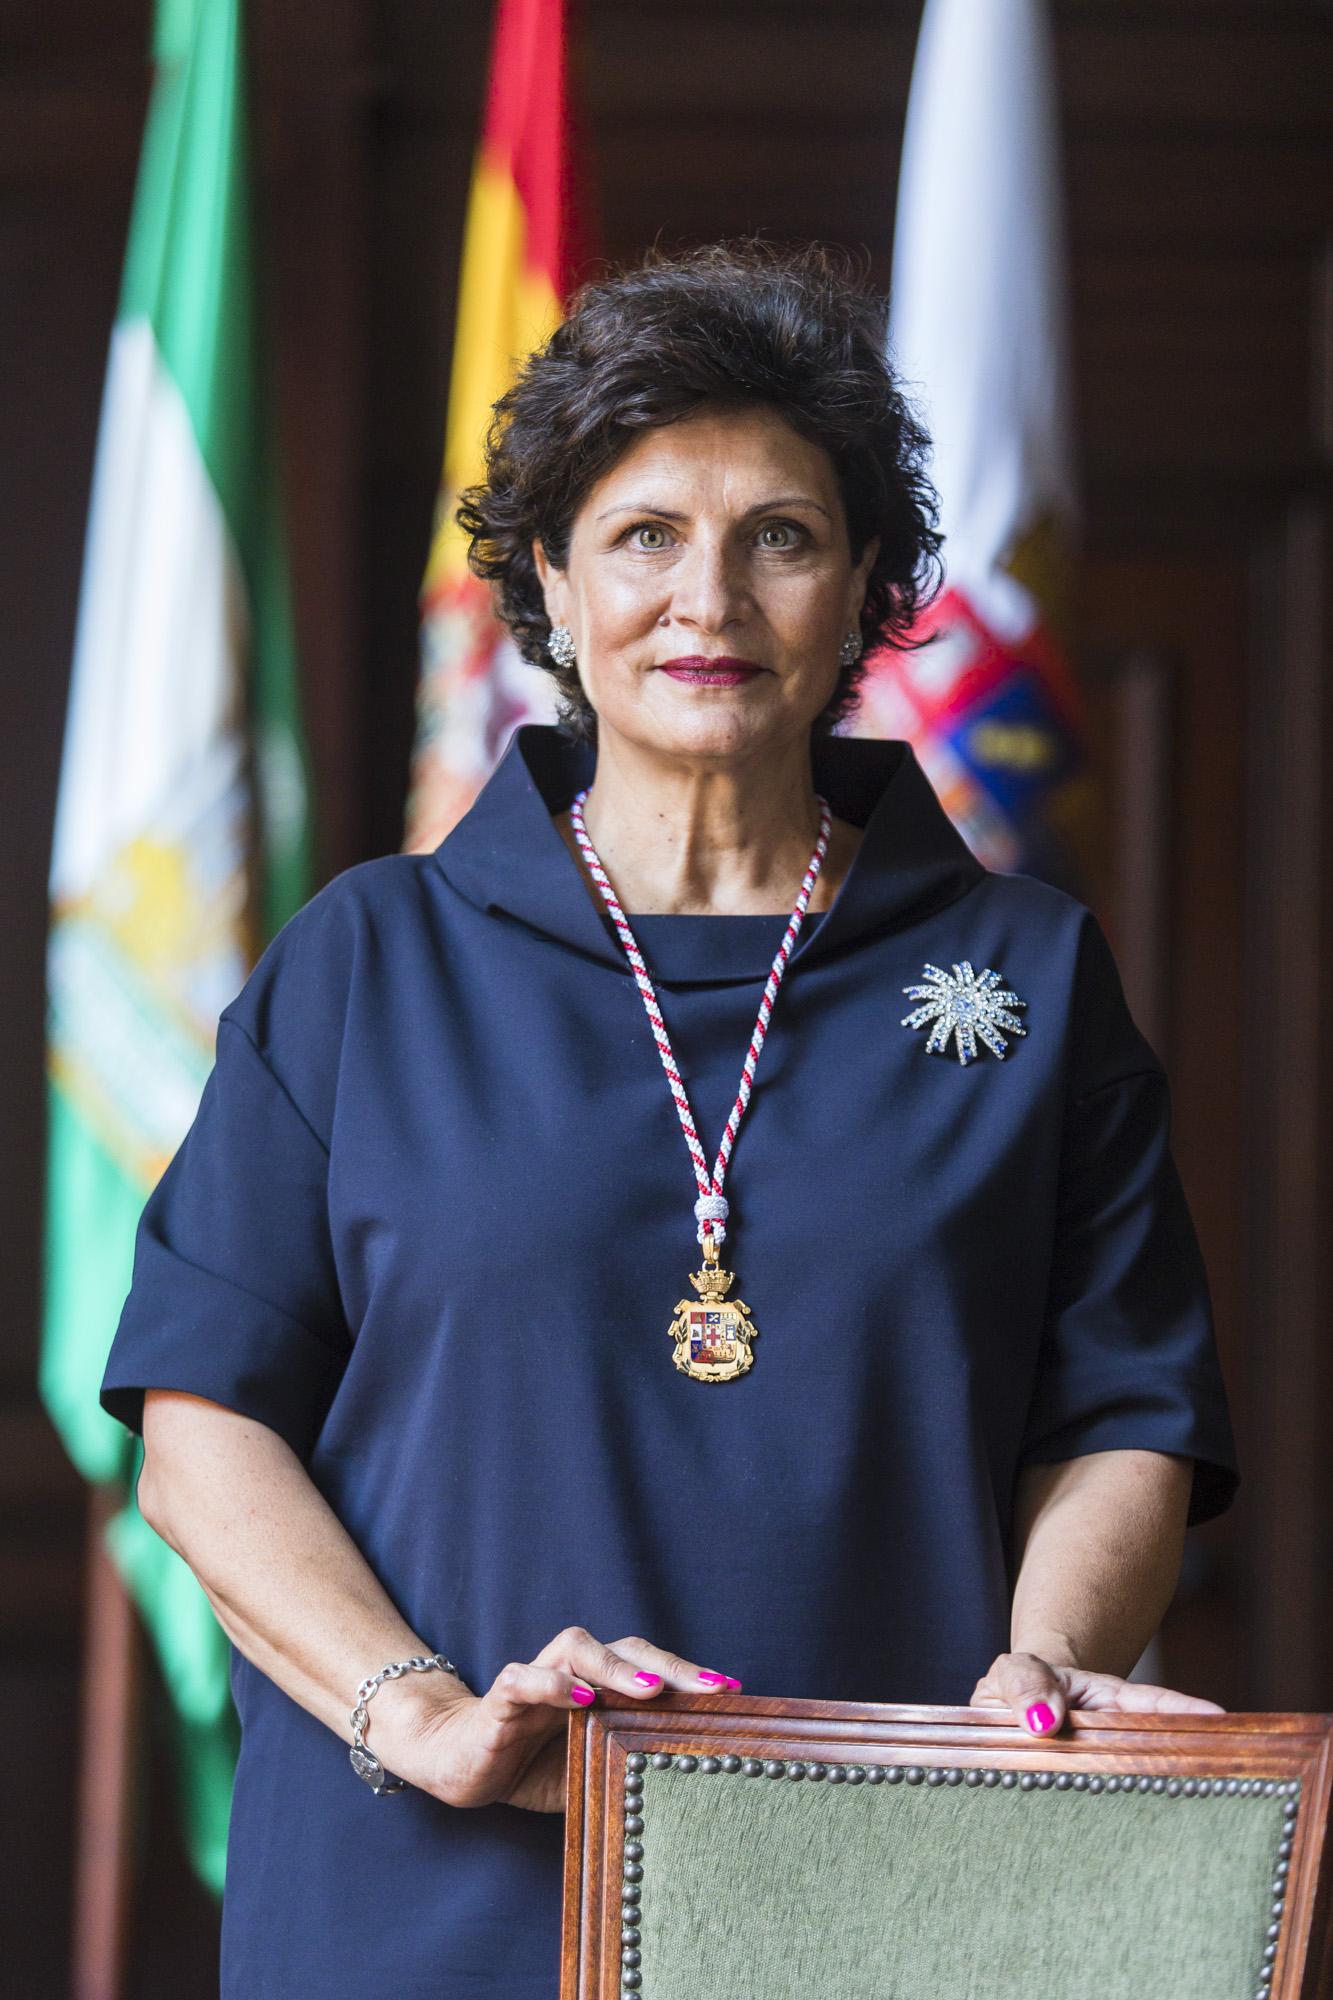 Carmen Navarro Cruz